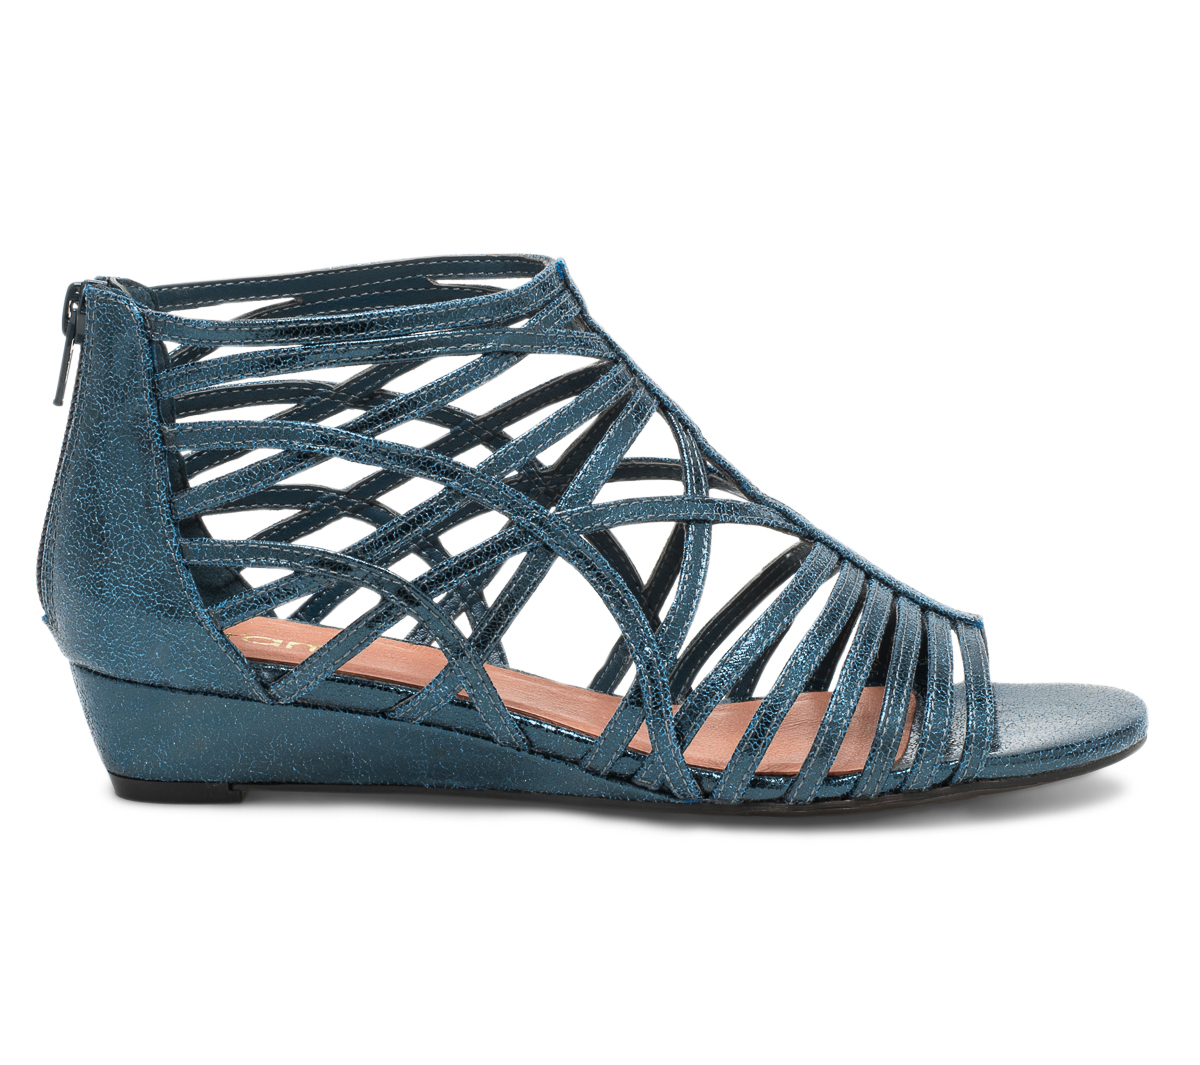 Métallisé Sandale Bleu Brides Canard Eram À j54ARL